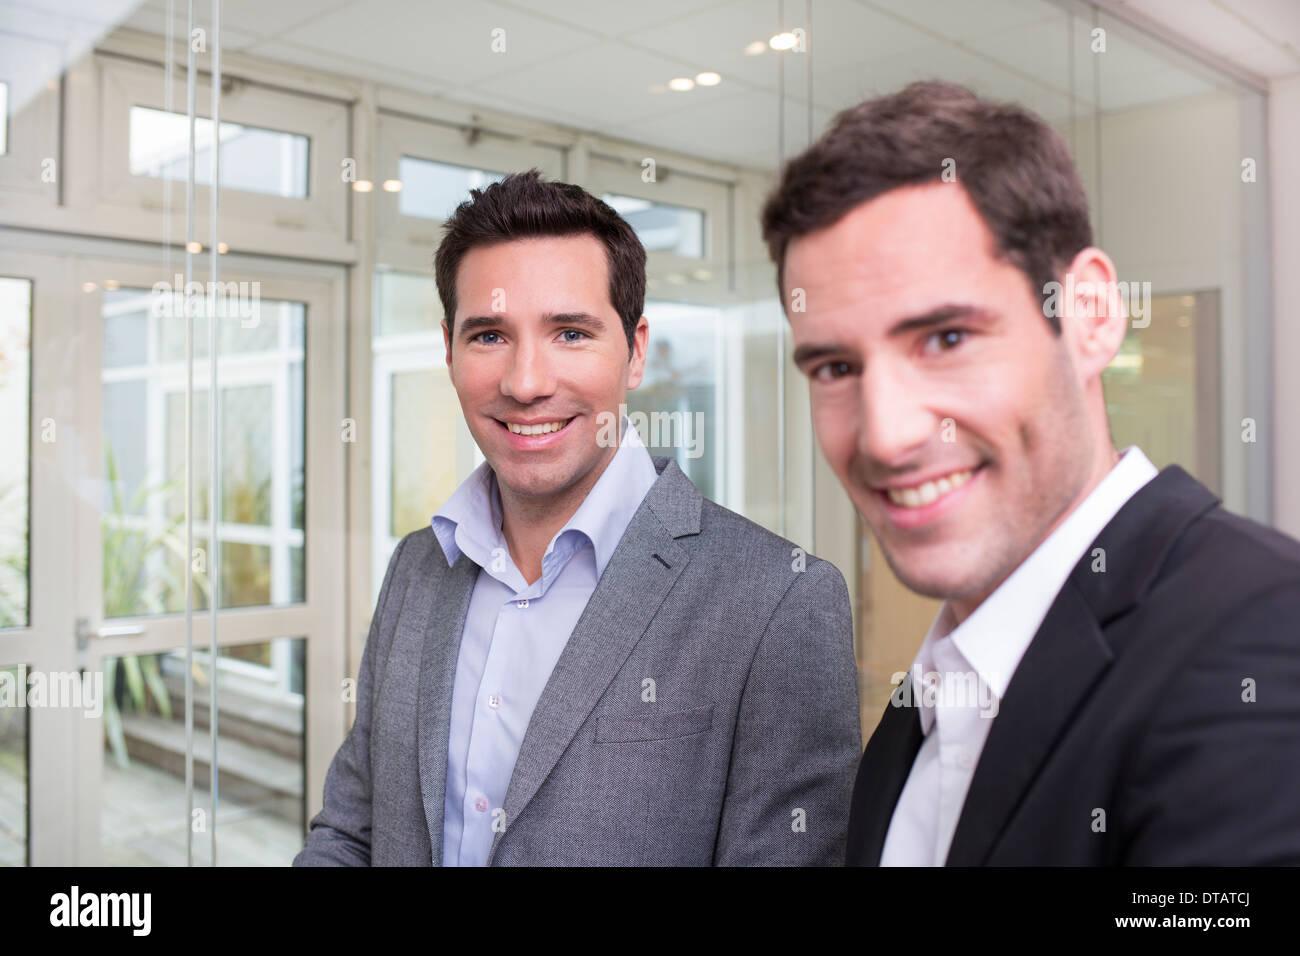 Portrait of Two smiling businessmen in office, à huis clos Banque D'Images